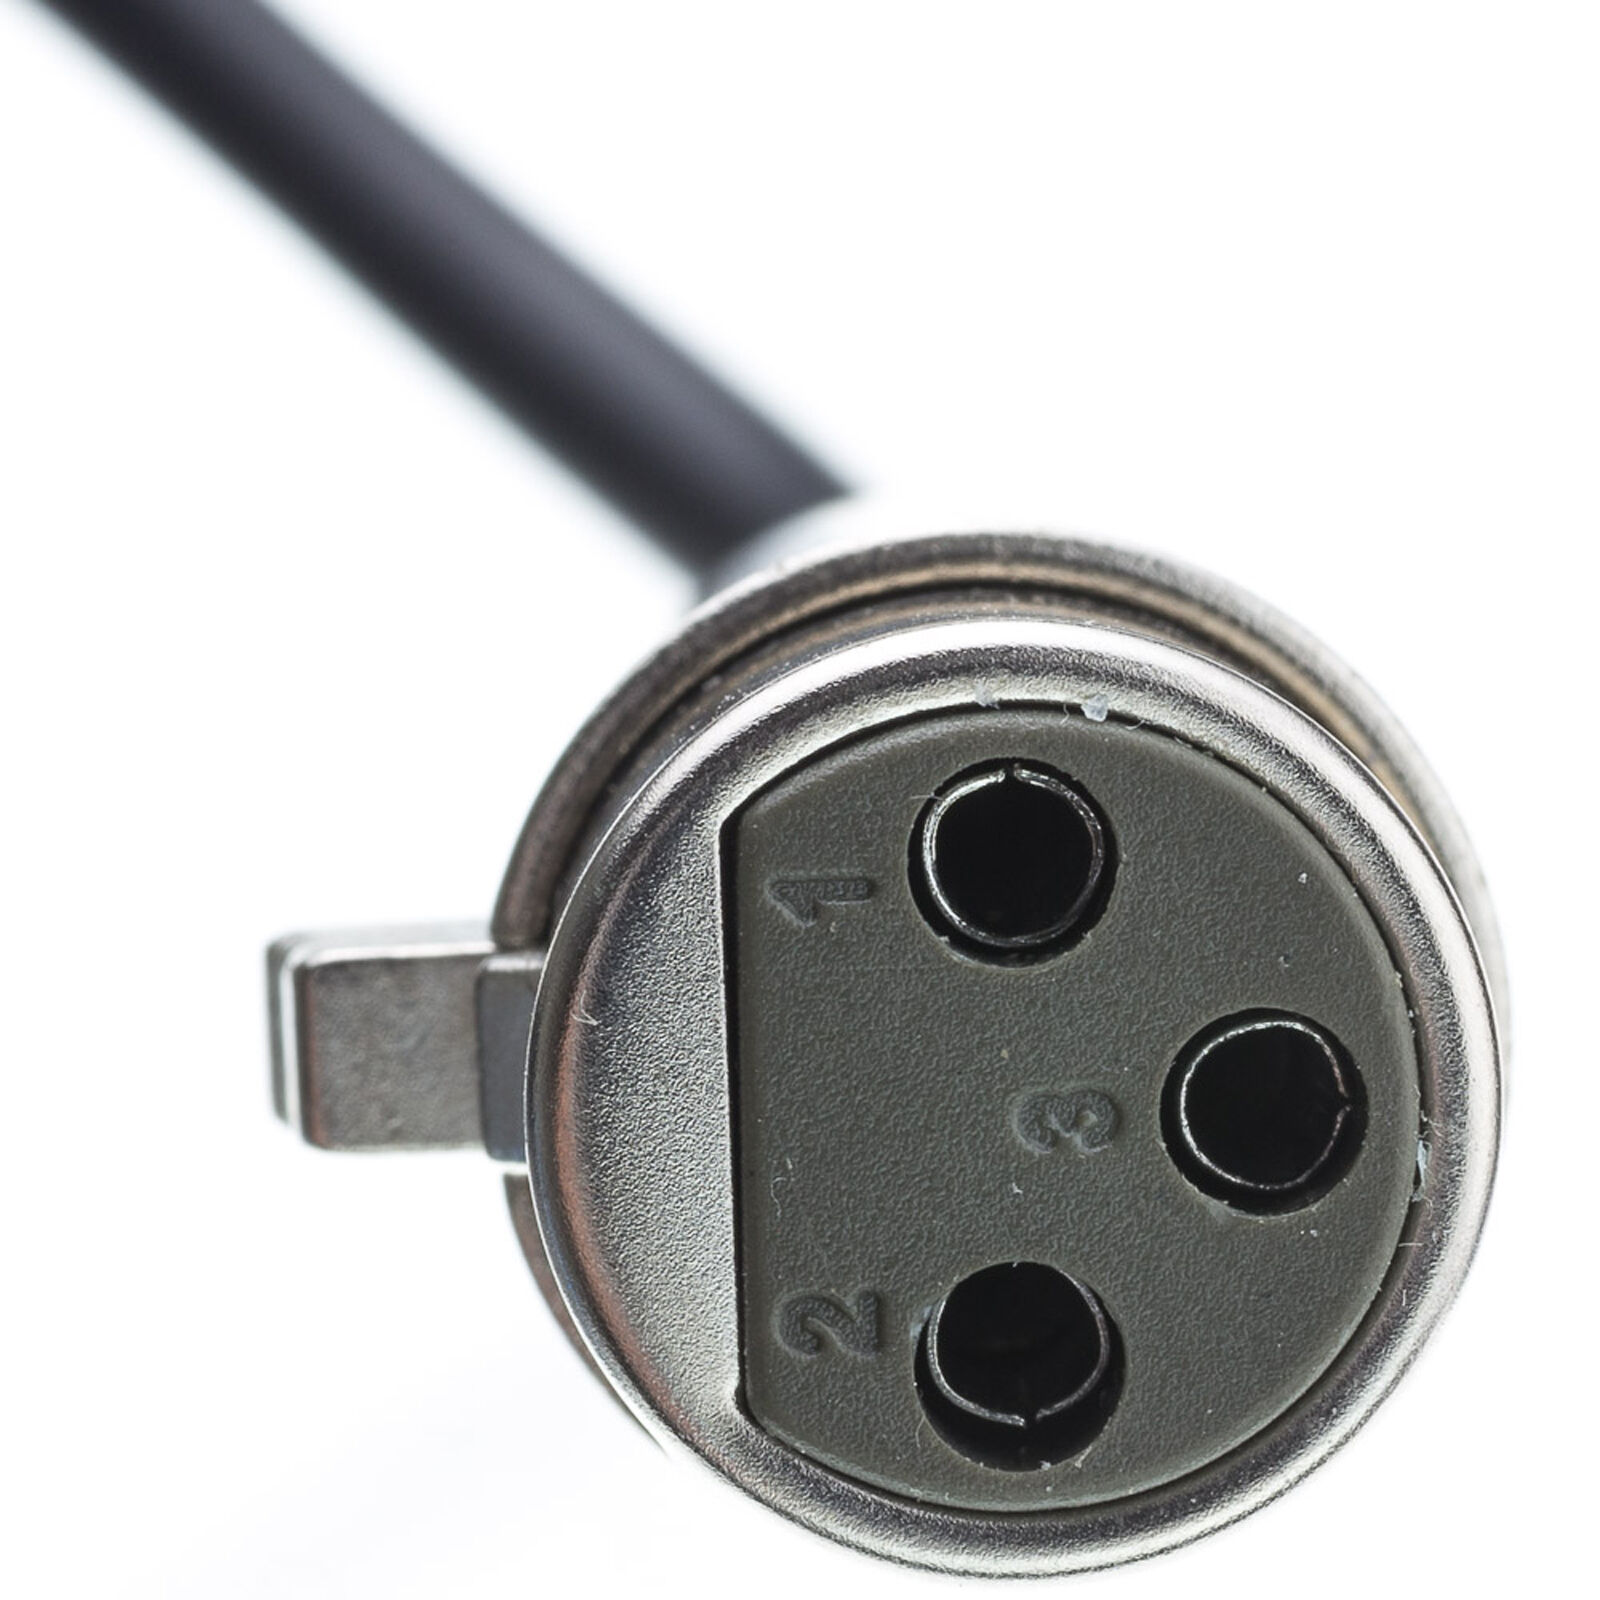 AVU XLR XLR XLR macho a hembra Cable de audio XLR - (6ft-100ft) caa489